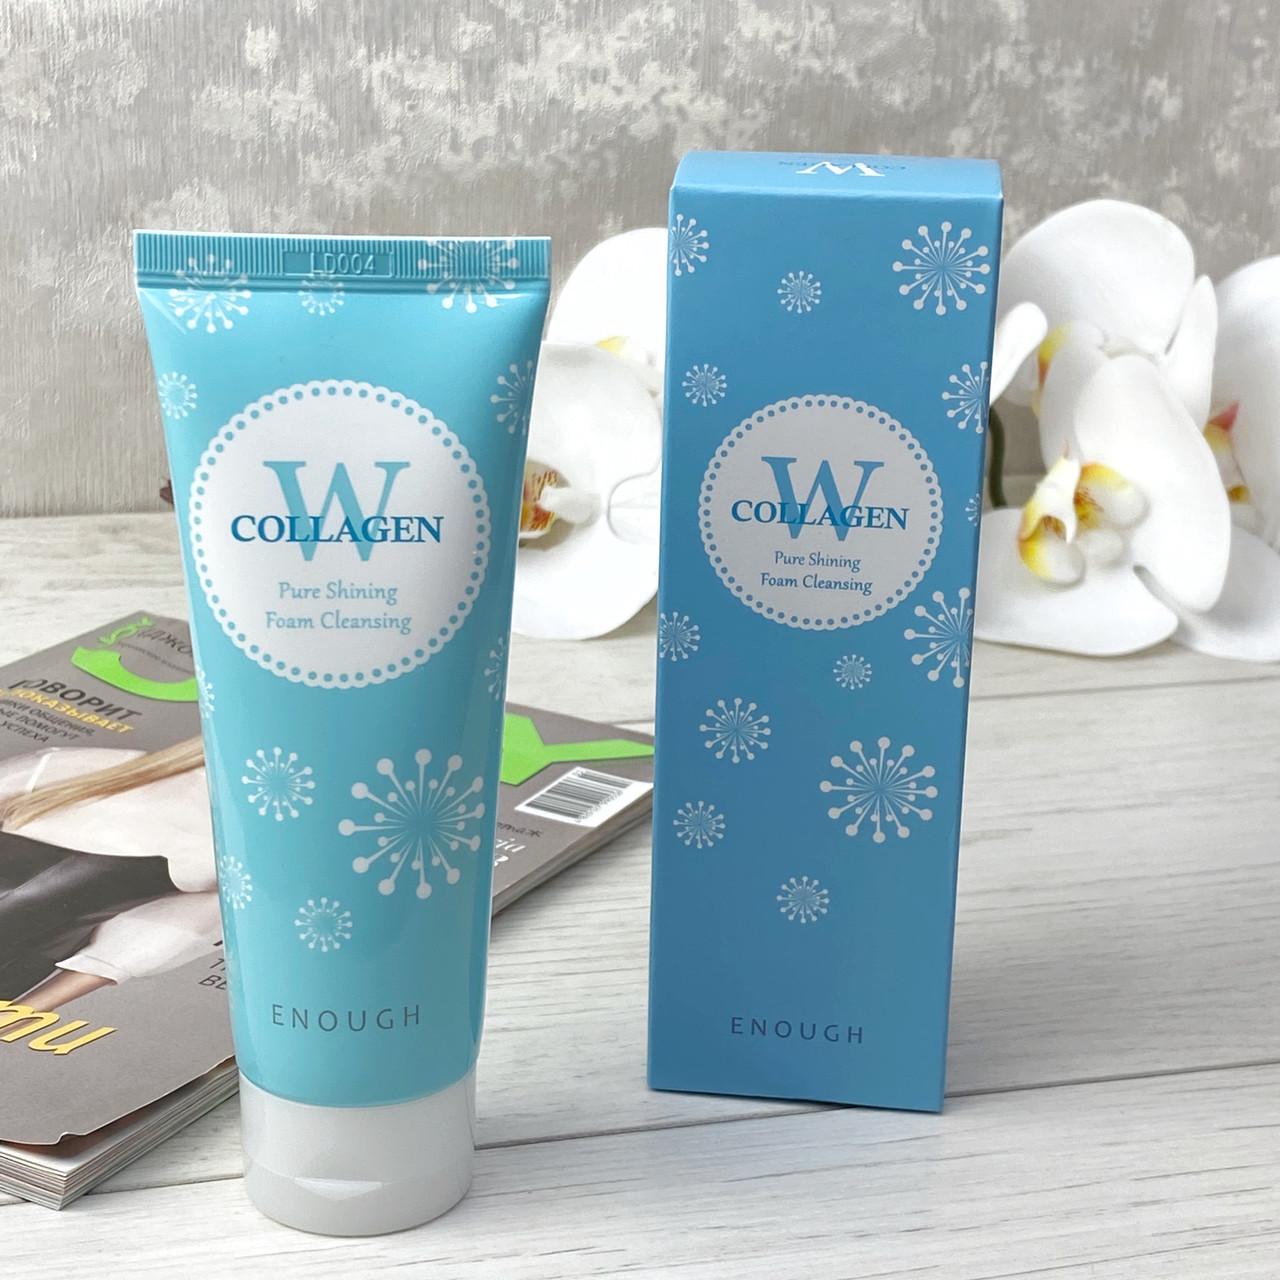 Очищающая пенка с коллагеном W Collagen Pure Shining Foam Cleansing Enough